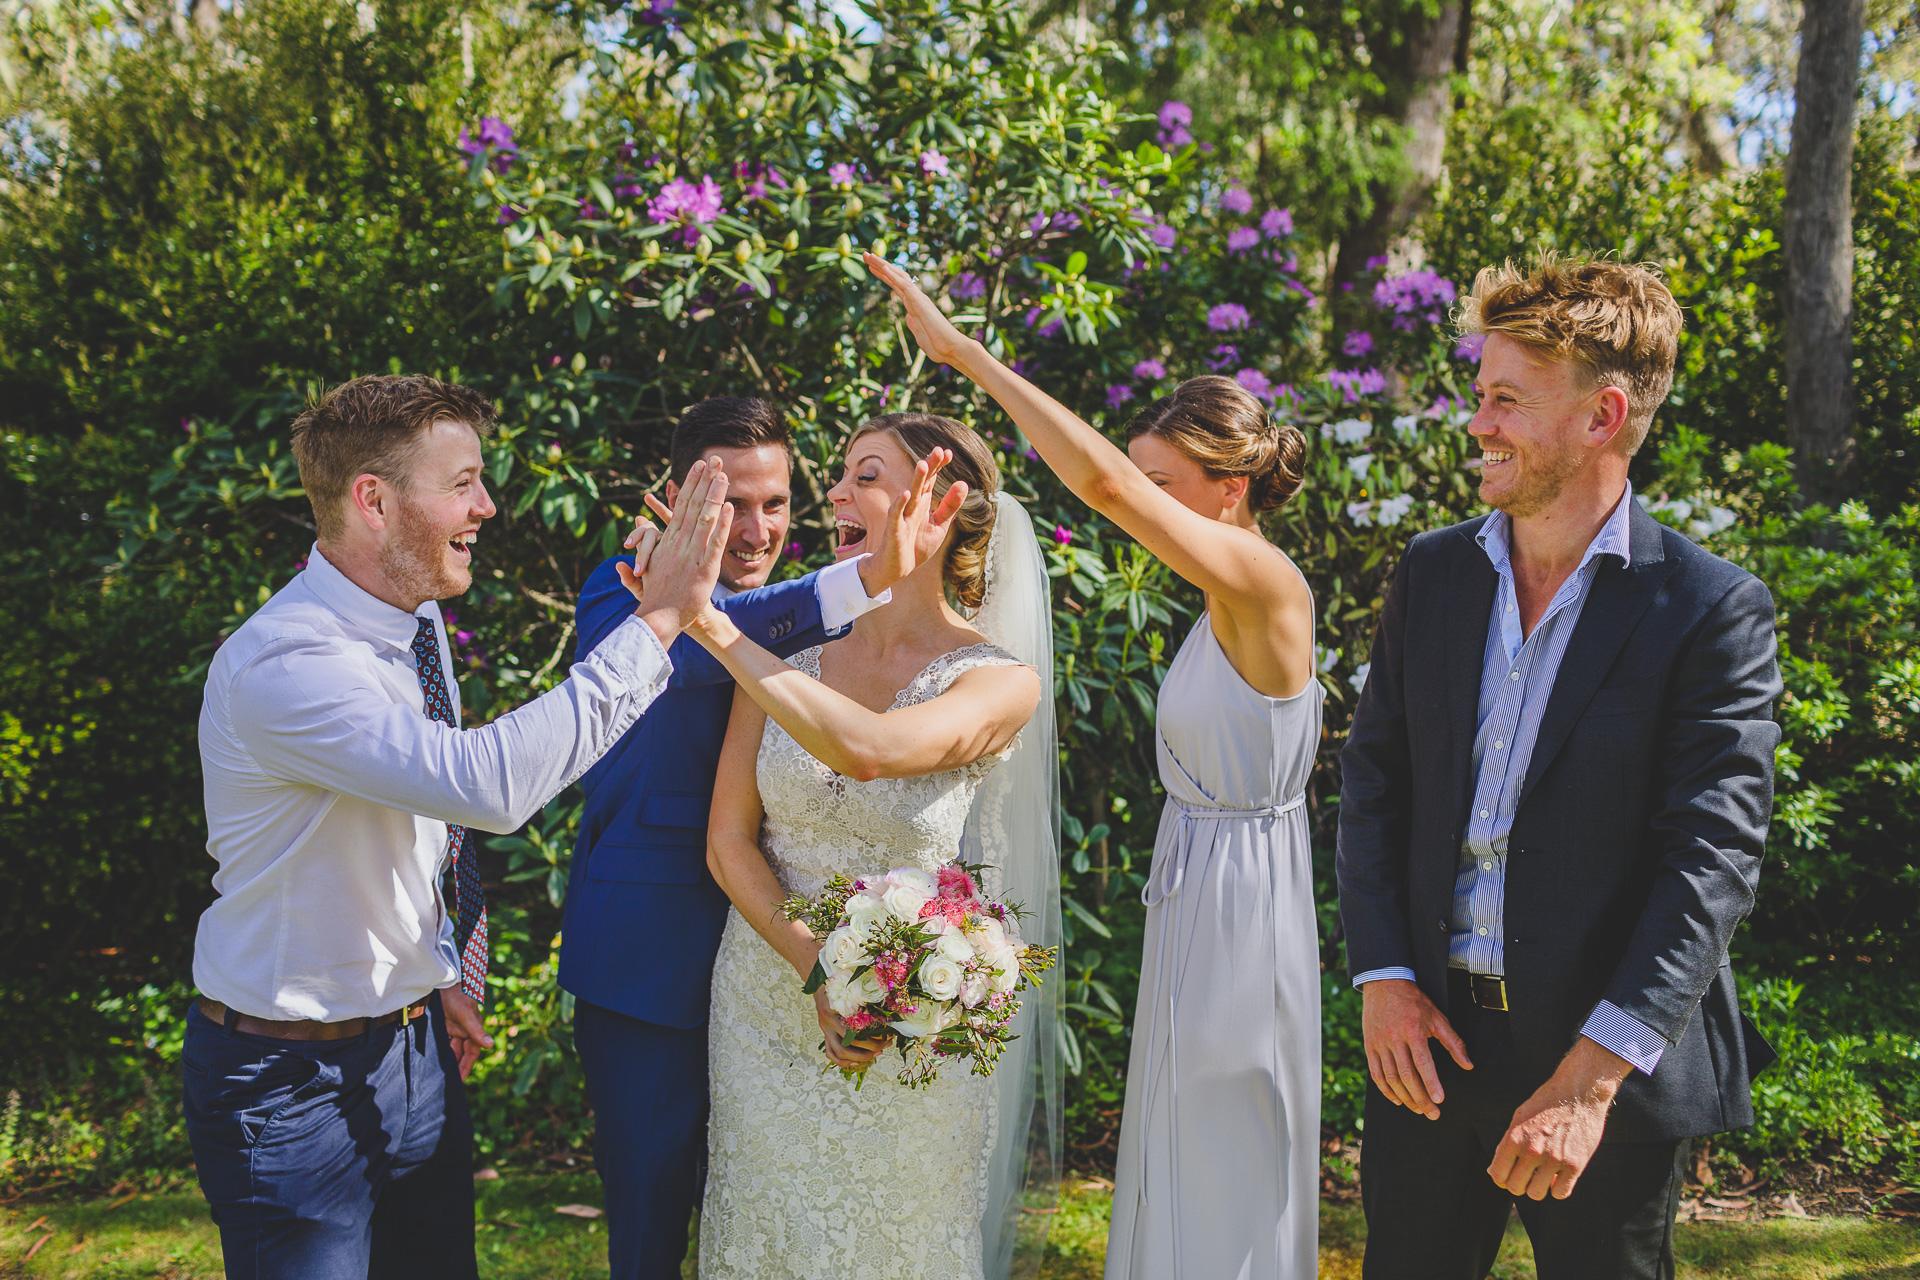 20161112 - Heath_Ruth_Wombat_Hollow_Wedding | 271.jpg